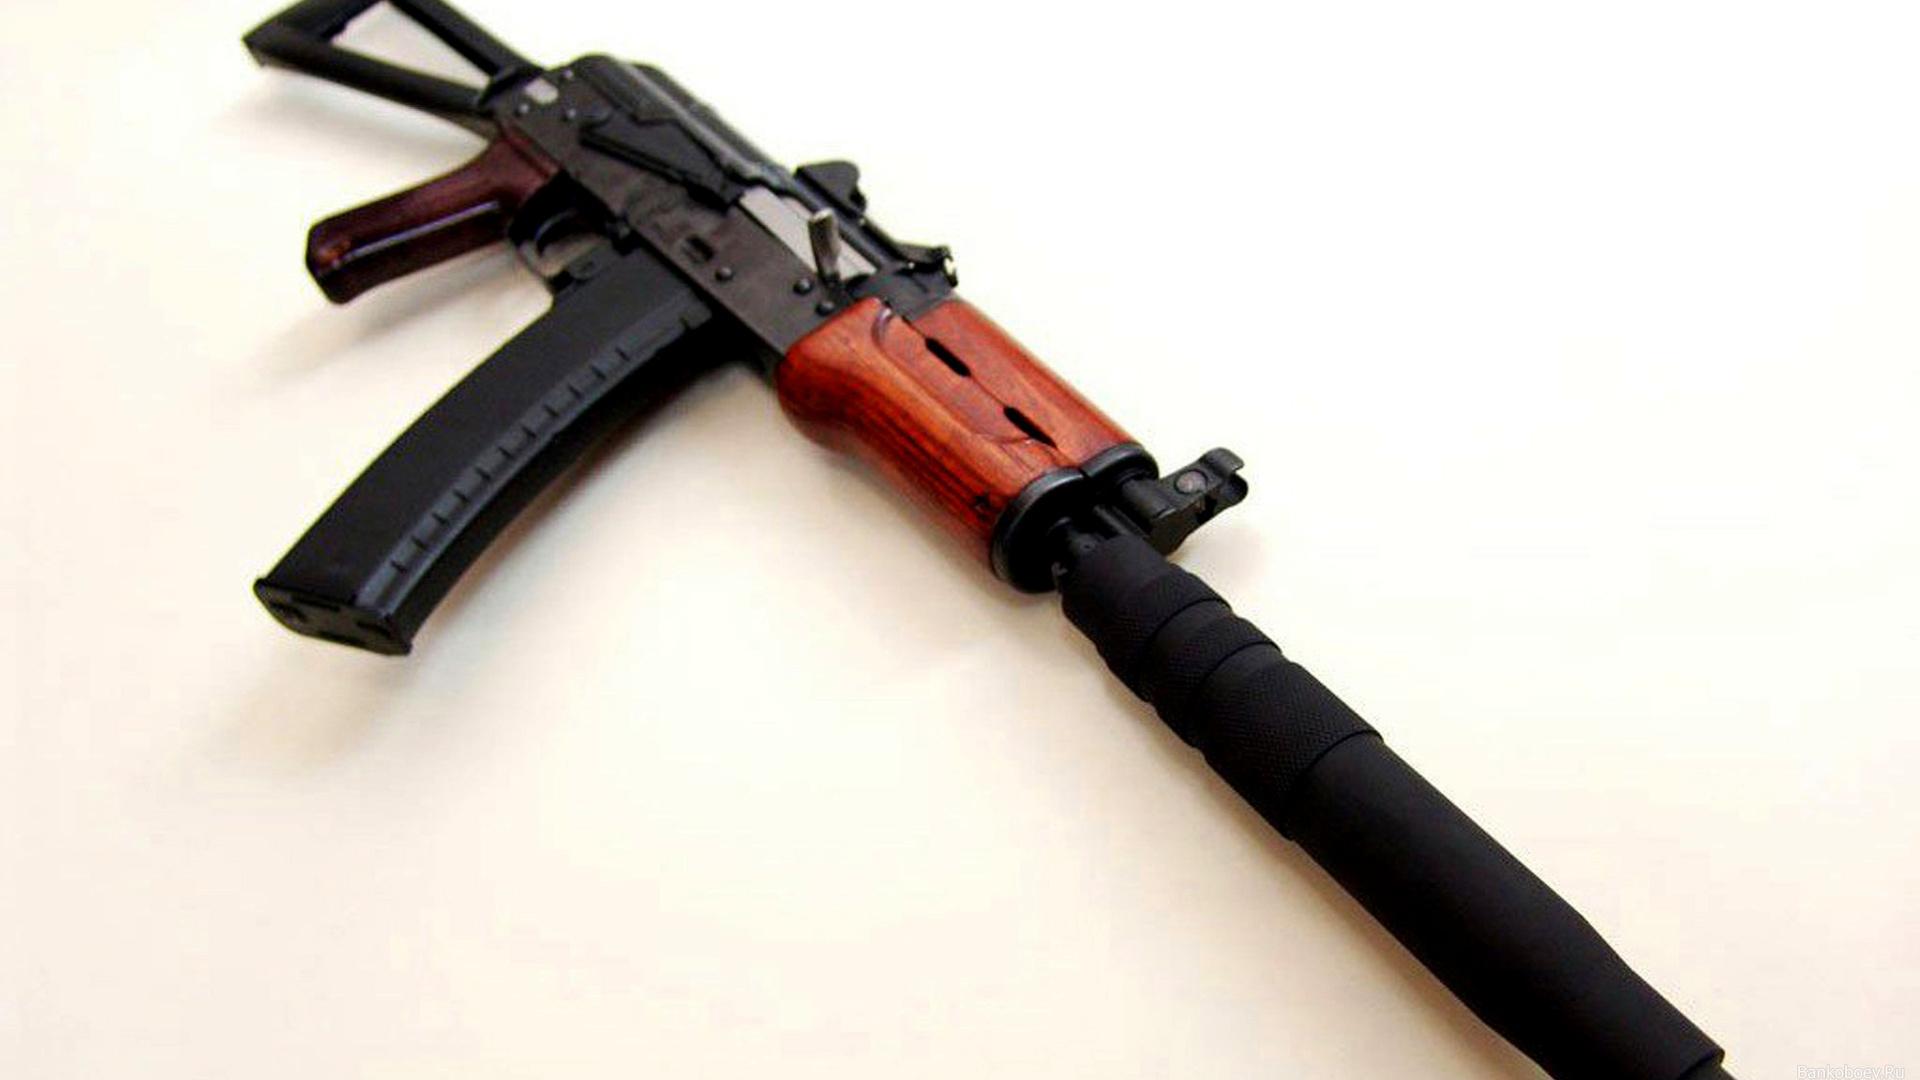 ... обои Ак 47, Ак 47 с глушителем: www.fullhdoboi.ru/photo/weapon/ak_47/35-0-6515